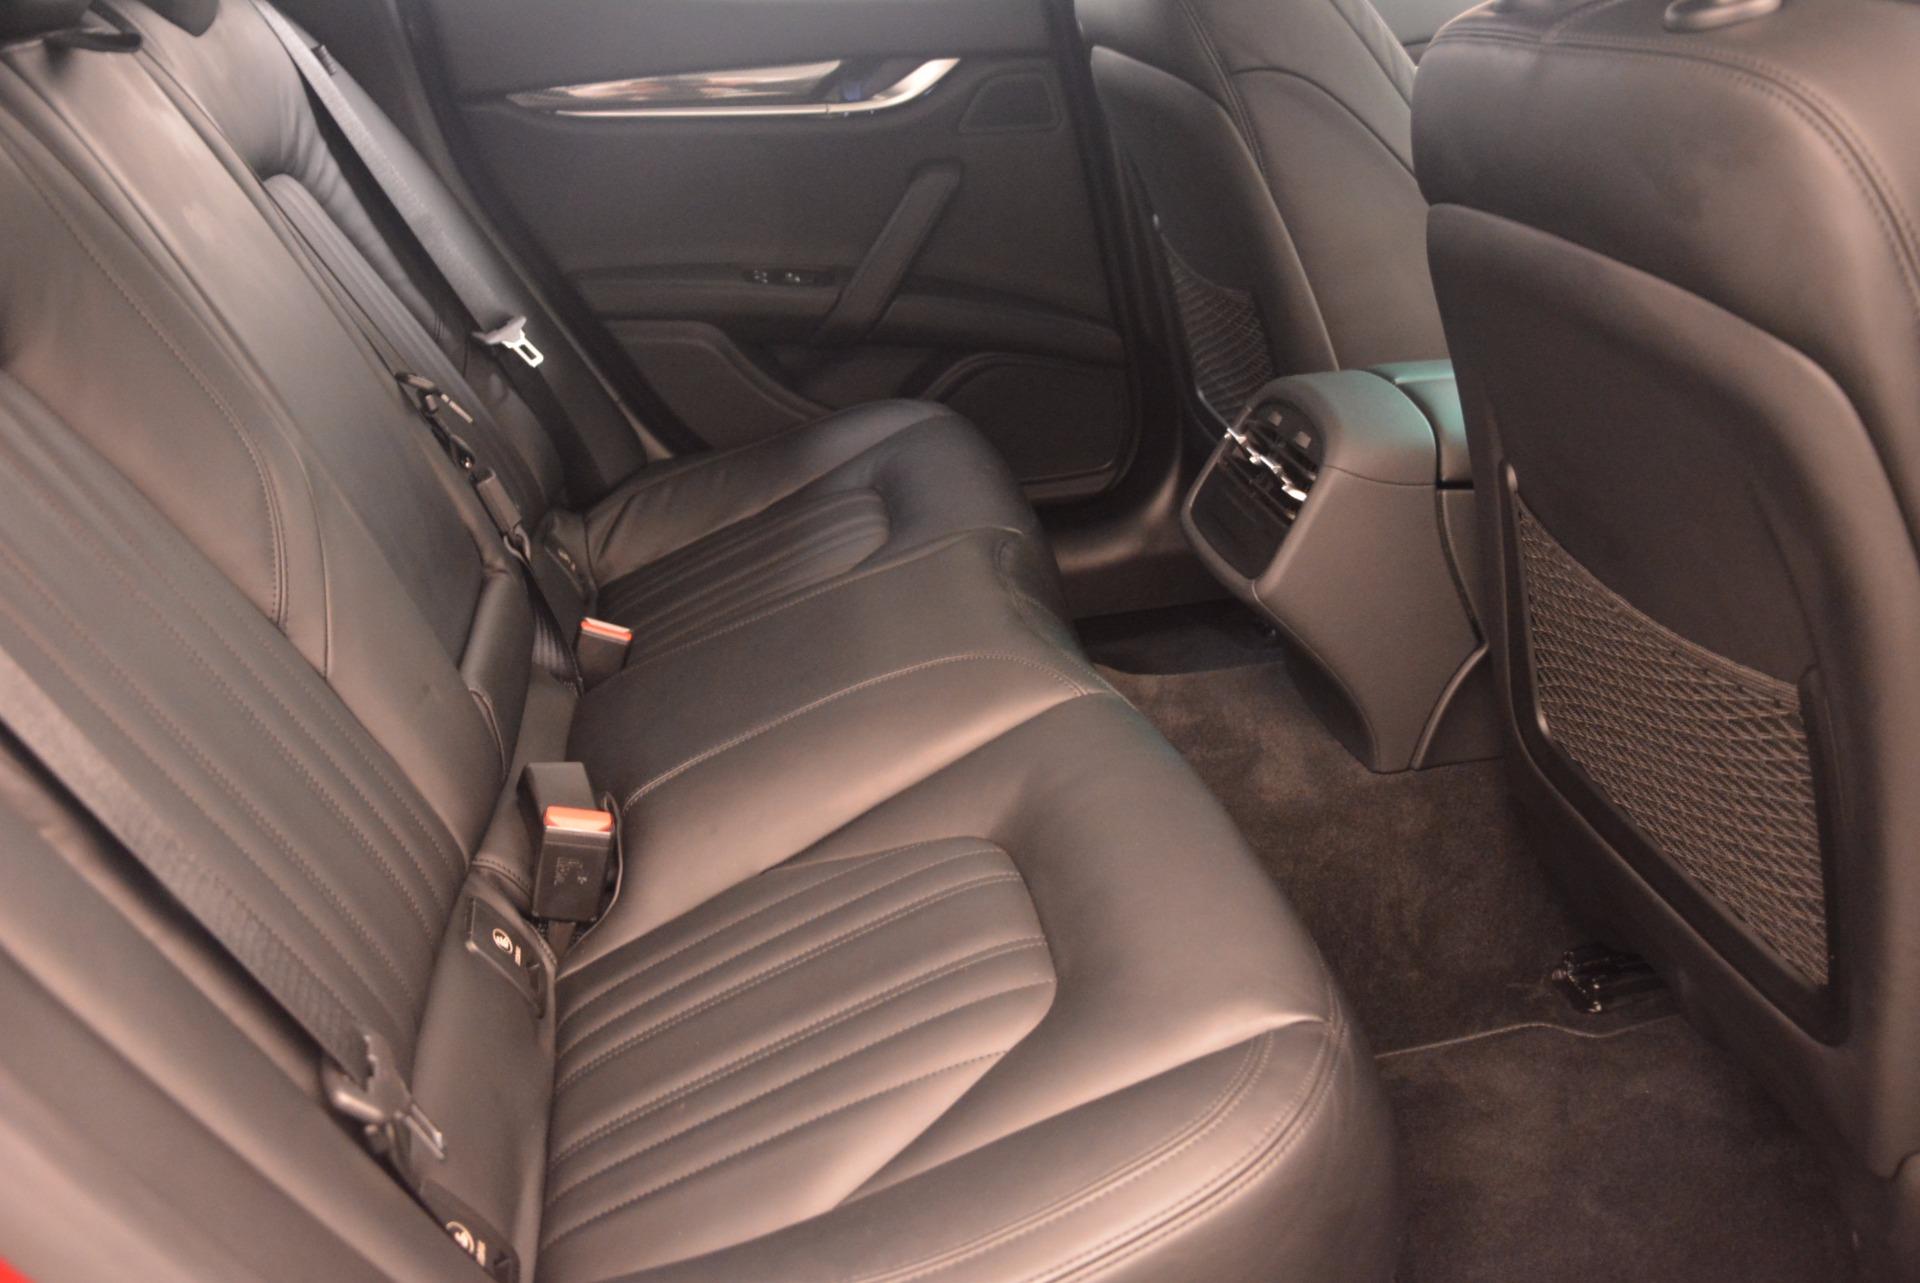 Used 2014 Maserati Ghibli S Q4 For Sale In Greenwich, CT. Alfa Romeo of Greenwich, 7203 1158_p23